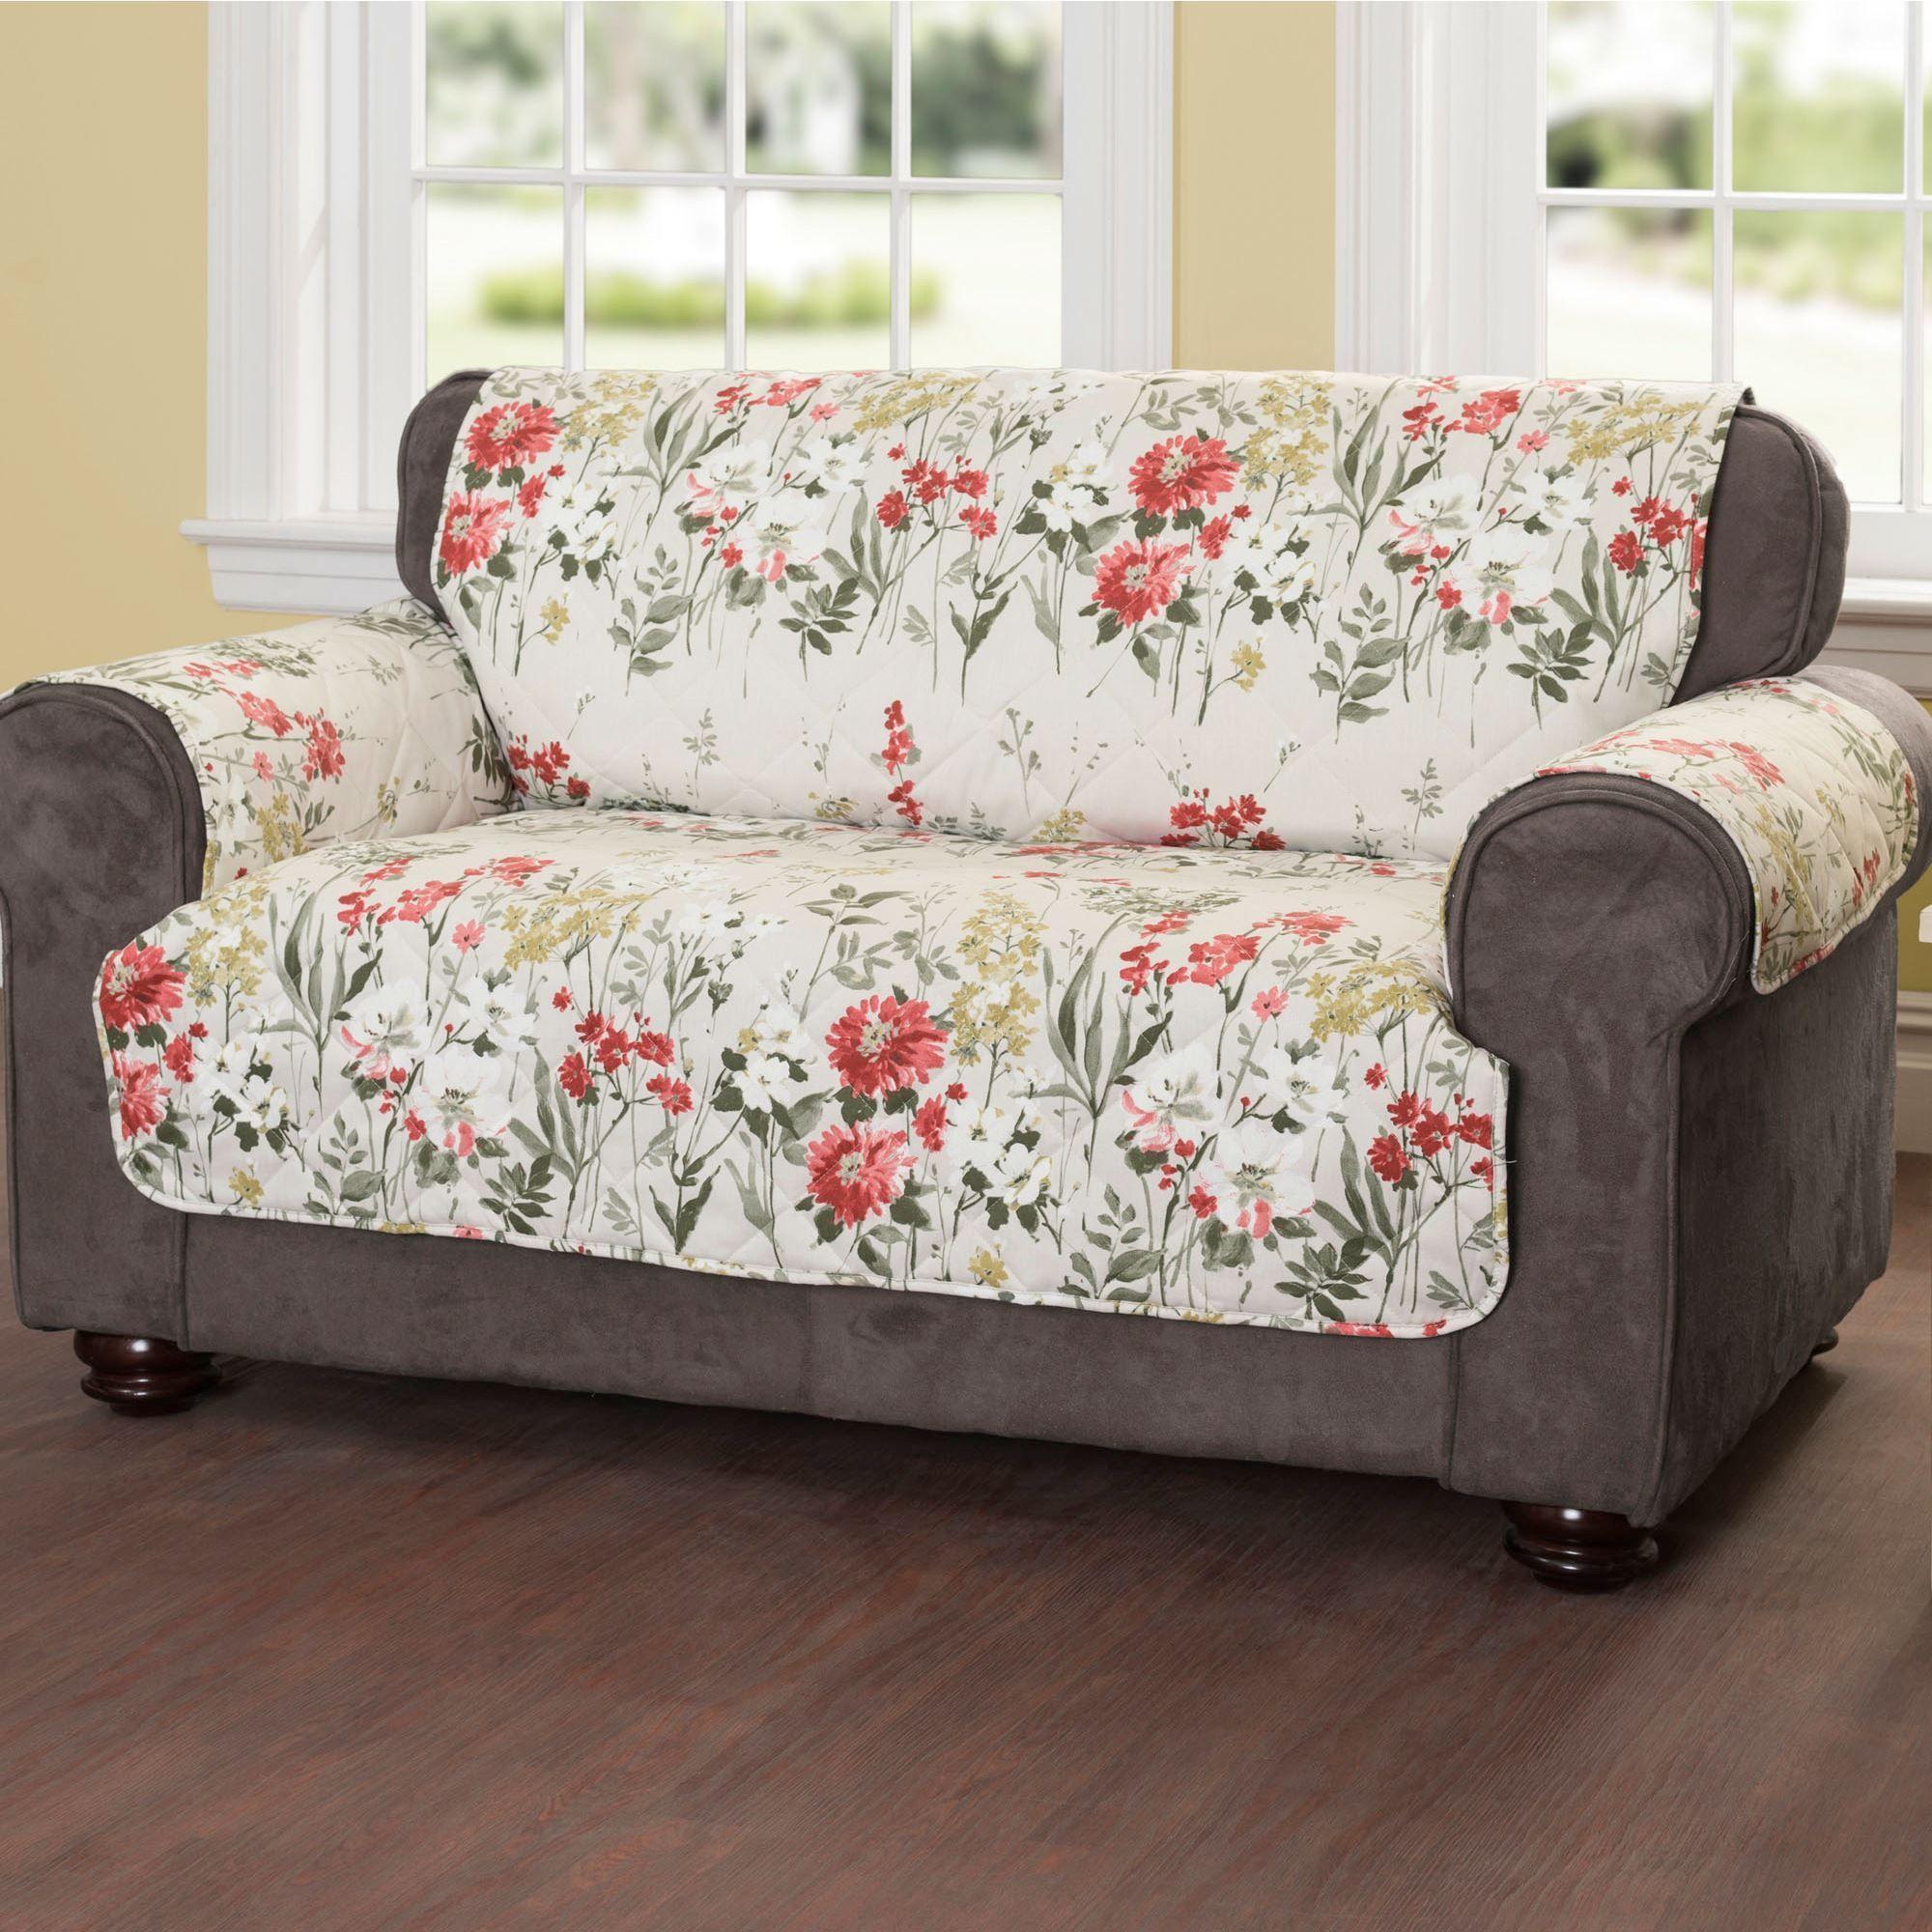 Floral Meadow Quilted Furniture Protectors Copridivani Idee Per La Casa Arredamento